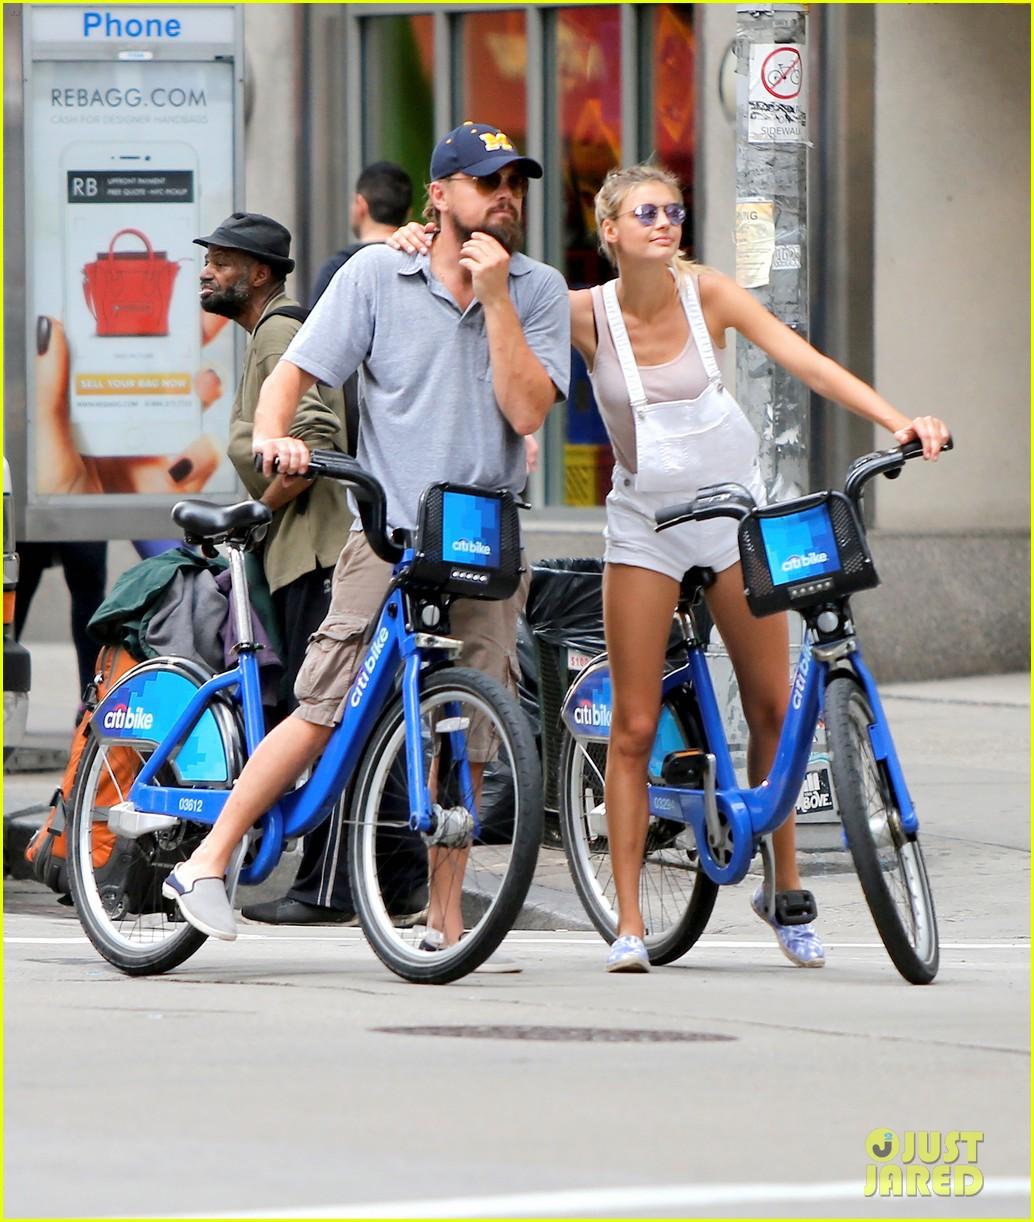 football dating cycling romances